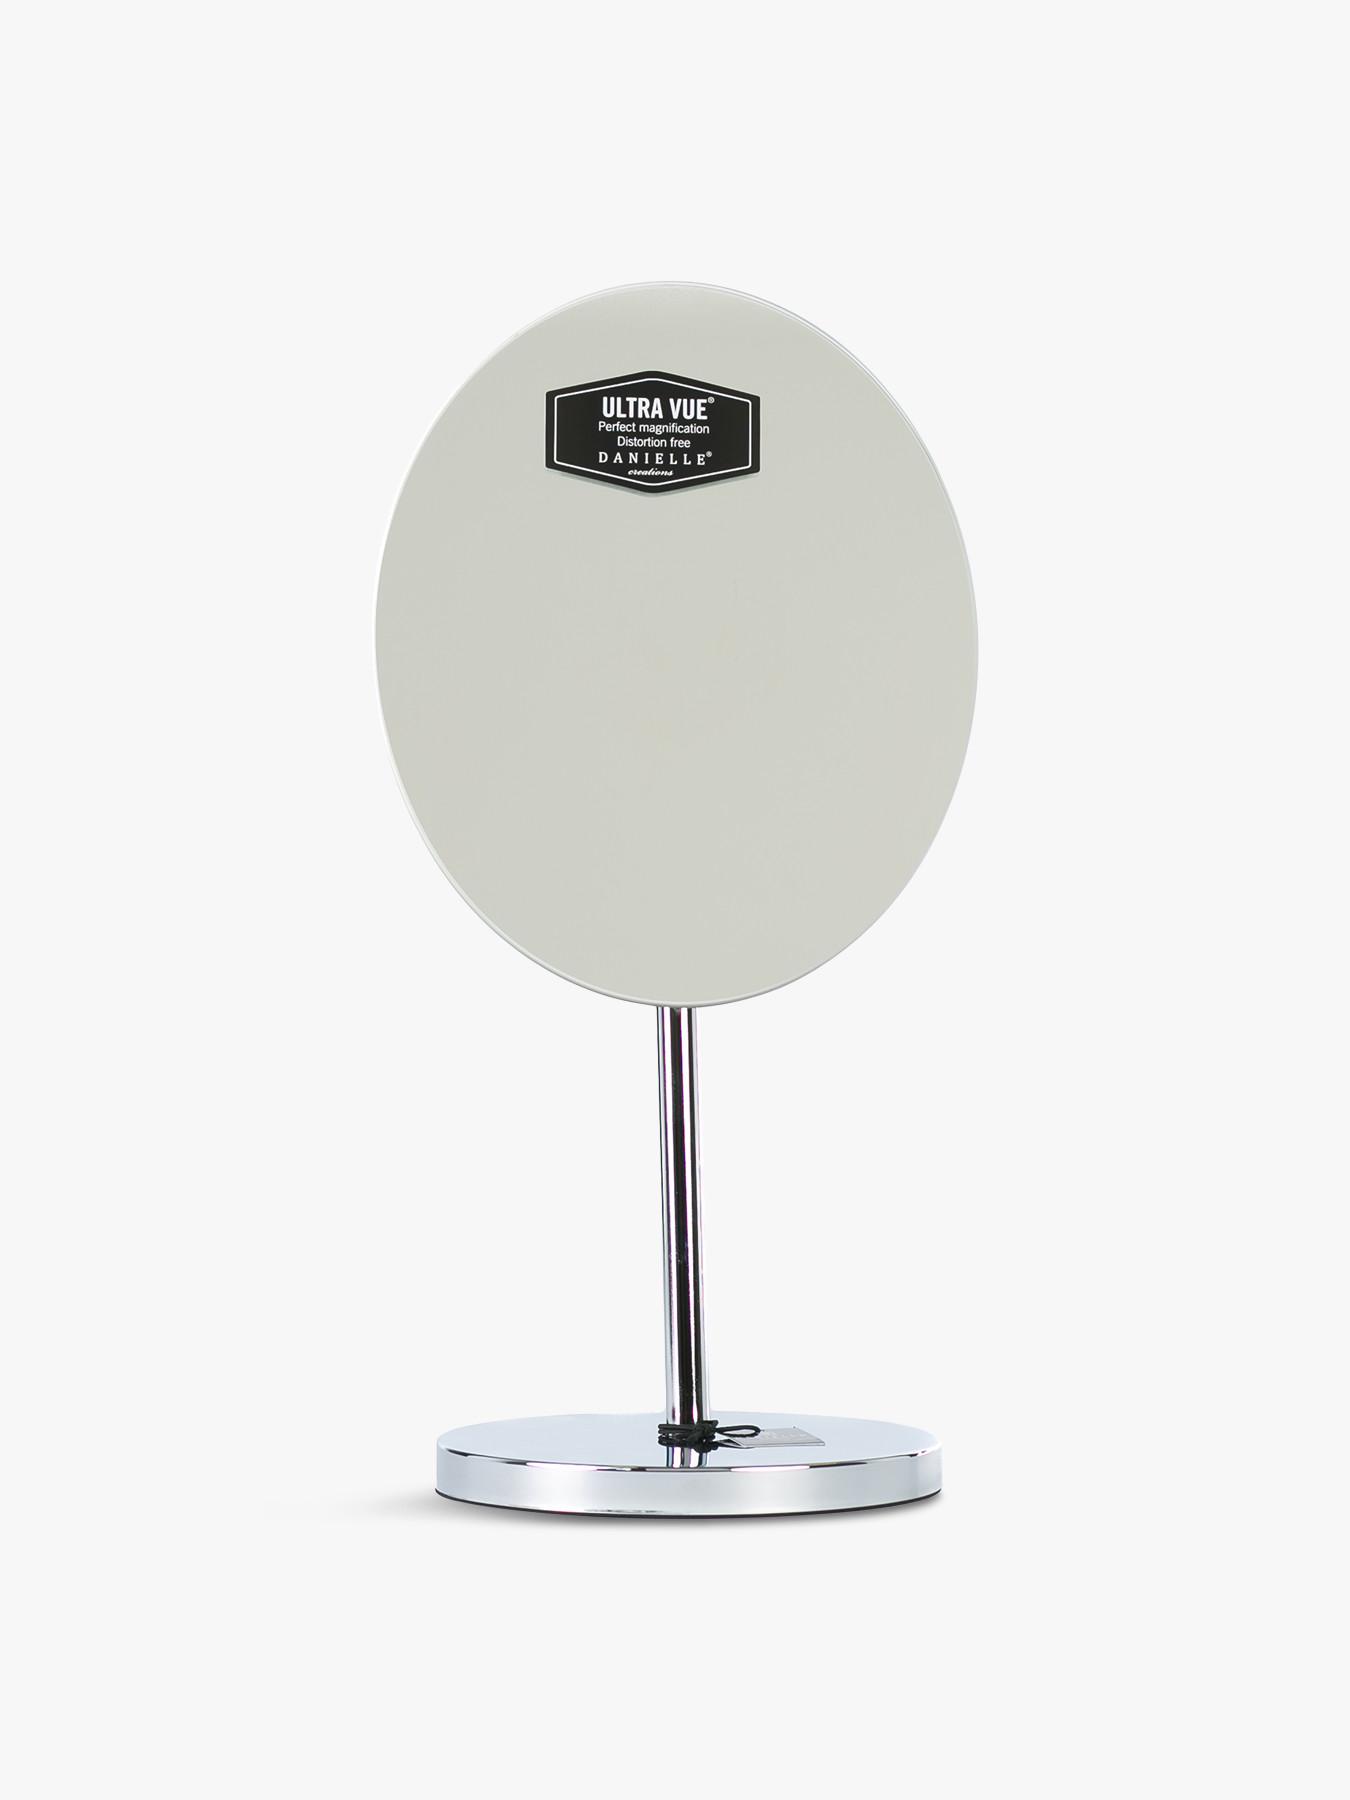 Danielle Oval Vanity Mirror Bathroom Accessories Fenwick